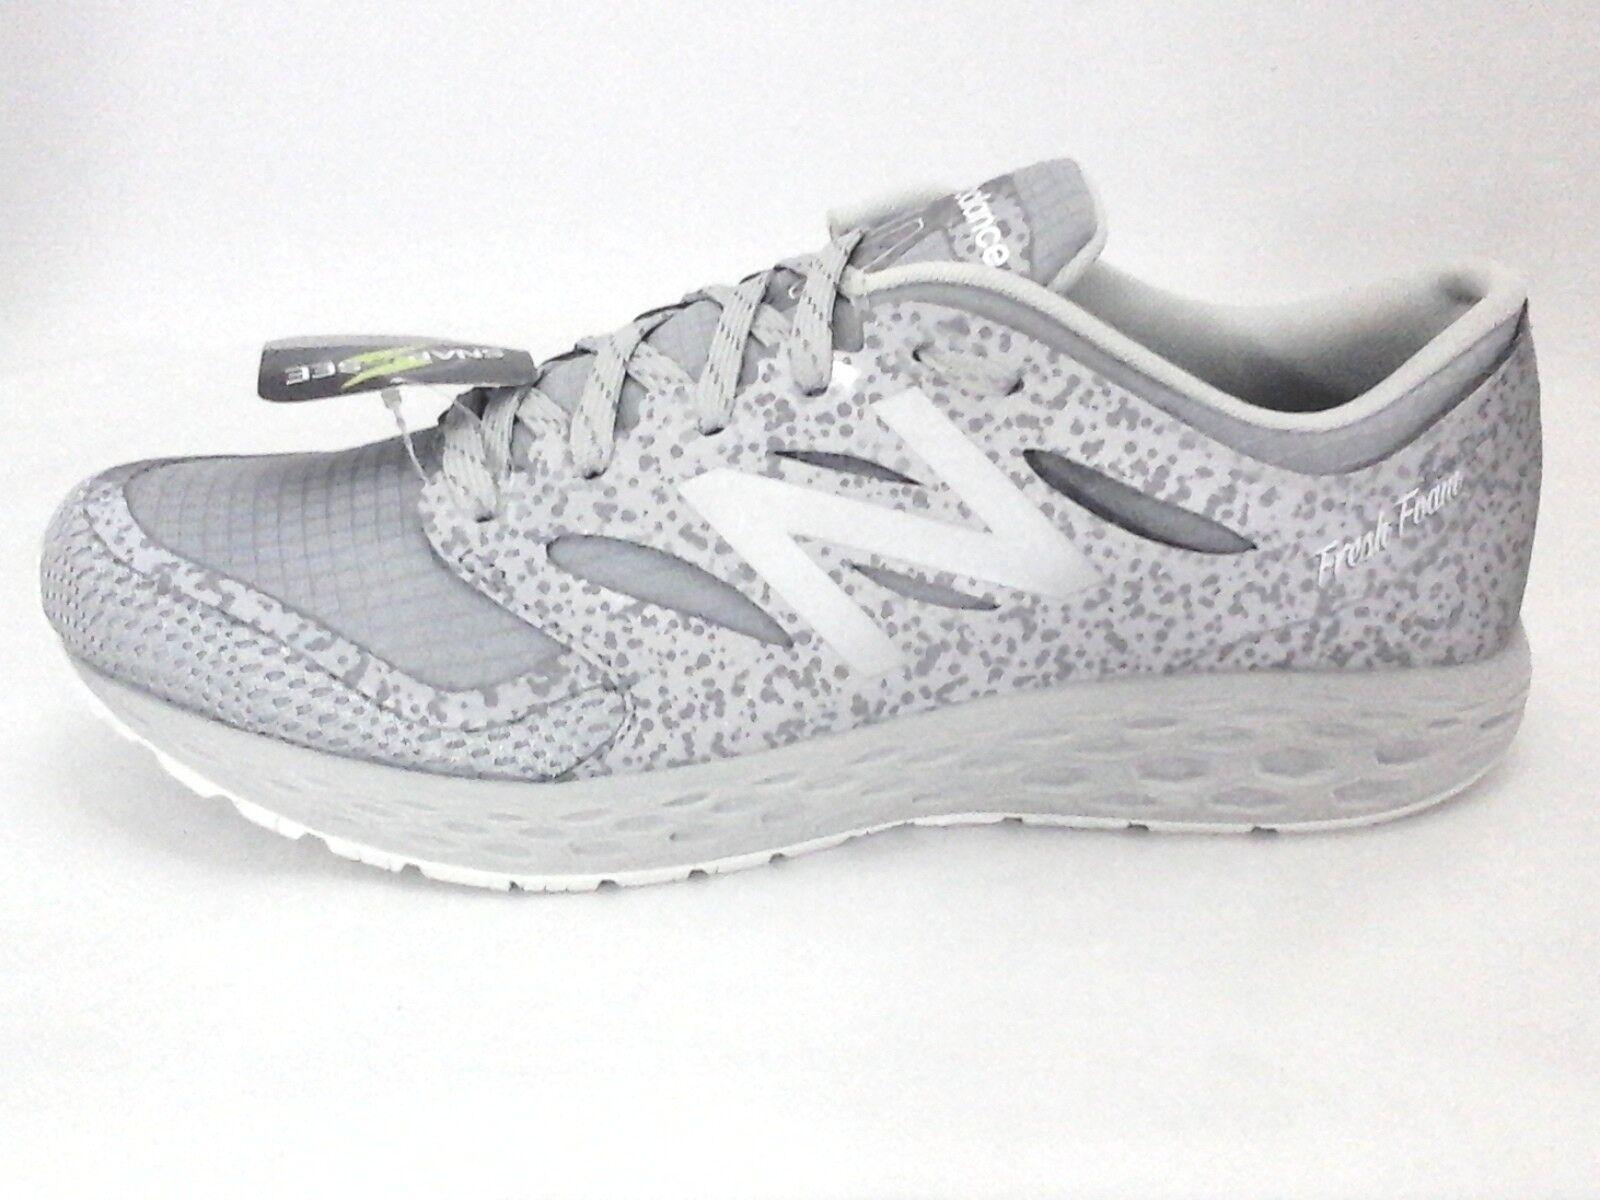 NEW BALANCE Fresh Foam Bonacay Reflective 9 Sneakers Gray Mens US 9 Reflective /42.5 2E Wide 65acfb